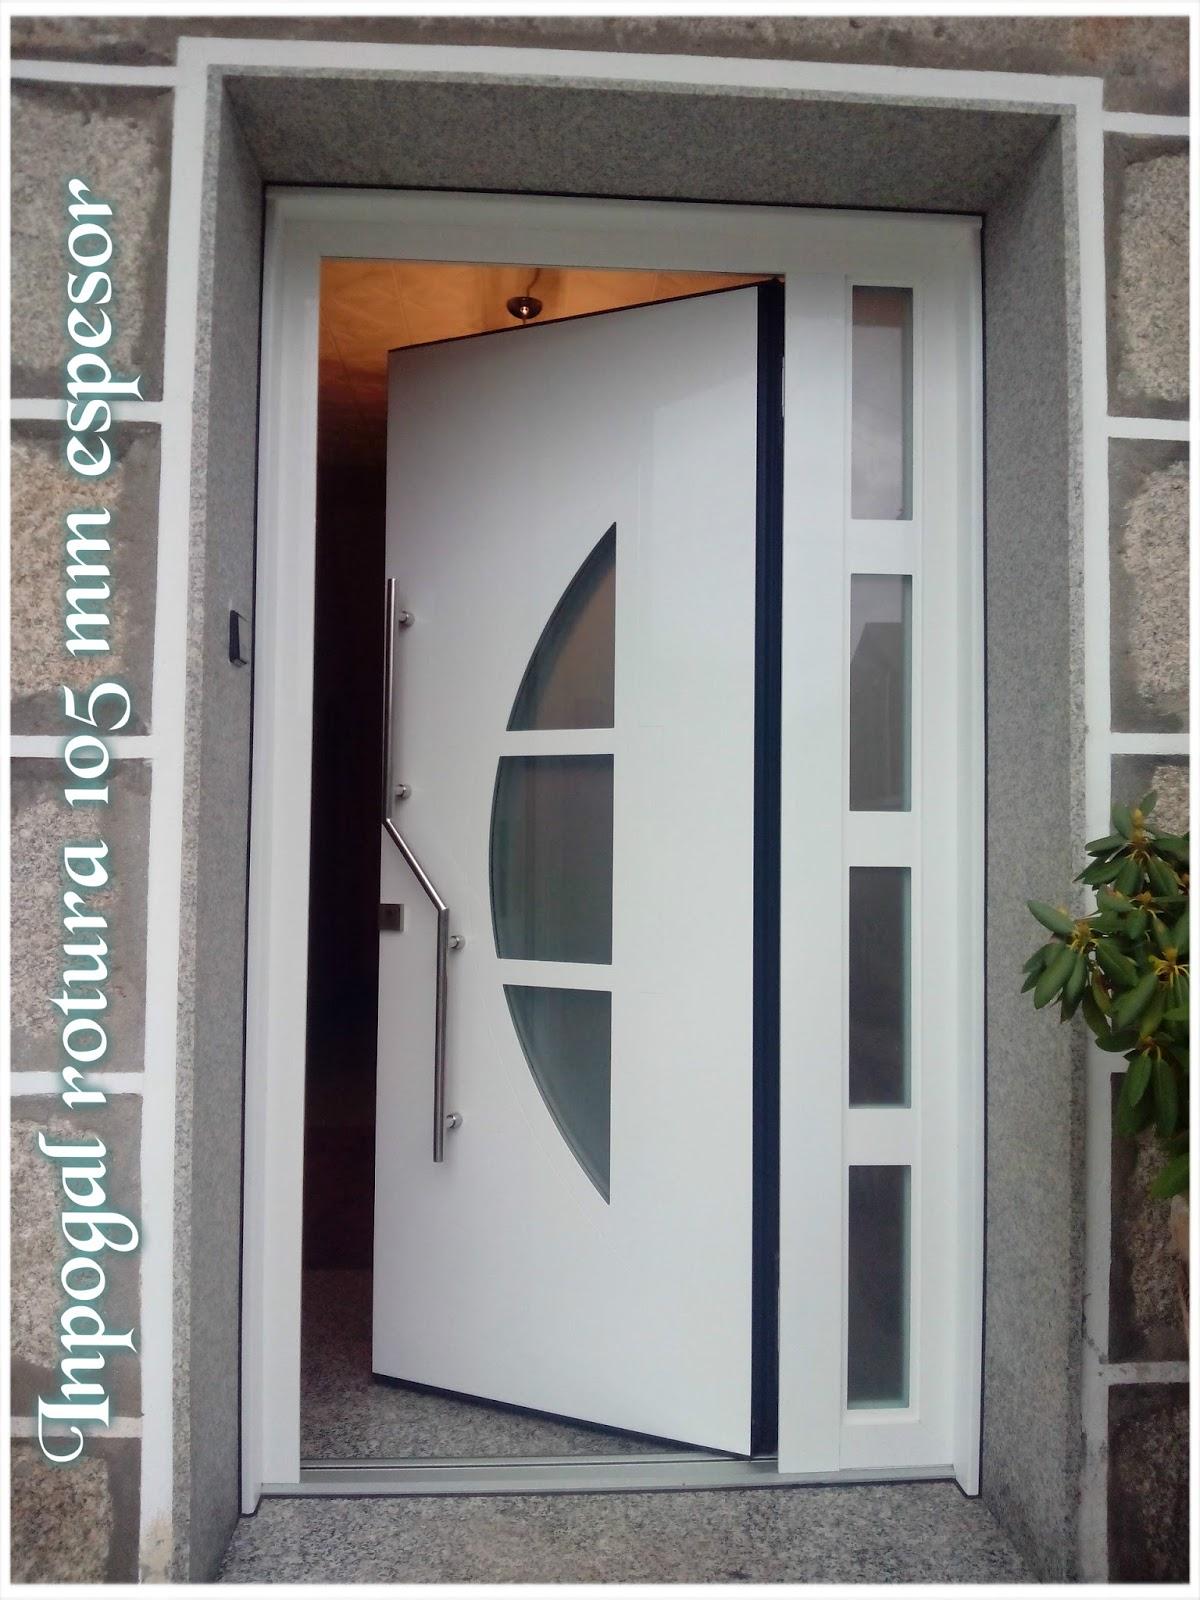 Puertas aluminio inpogal puertas de rotura serie prestige for Puertas en aluminio